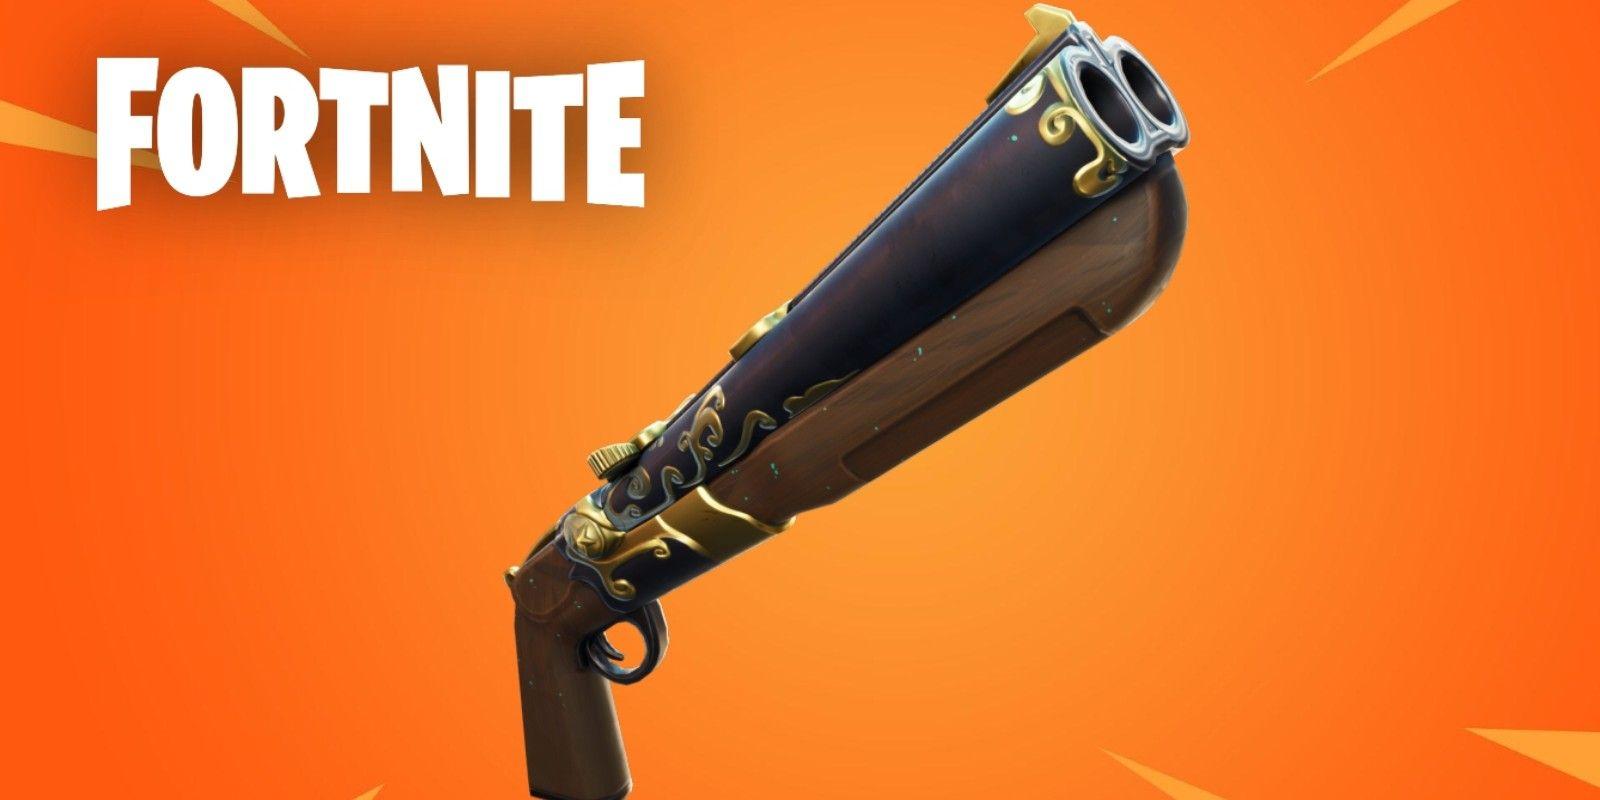 New Fortnite Double Barrel Shotgun How To Get The Double Pump Shotgun In Fortnite Screen Rant